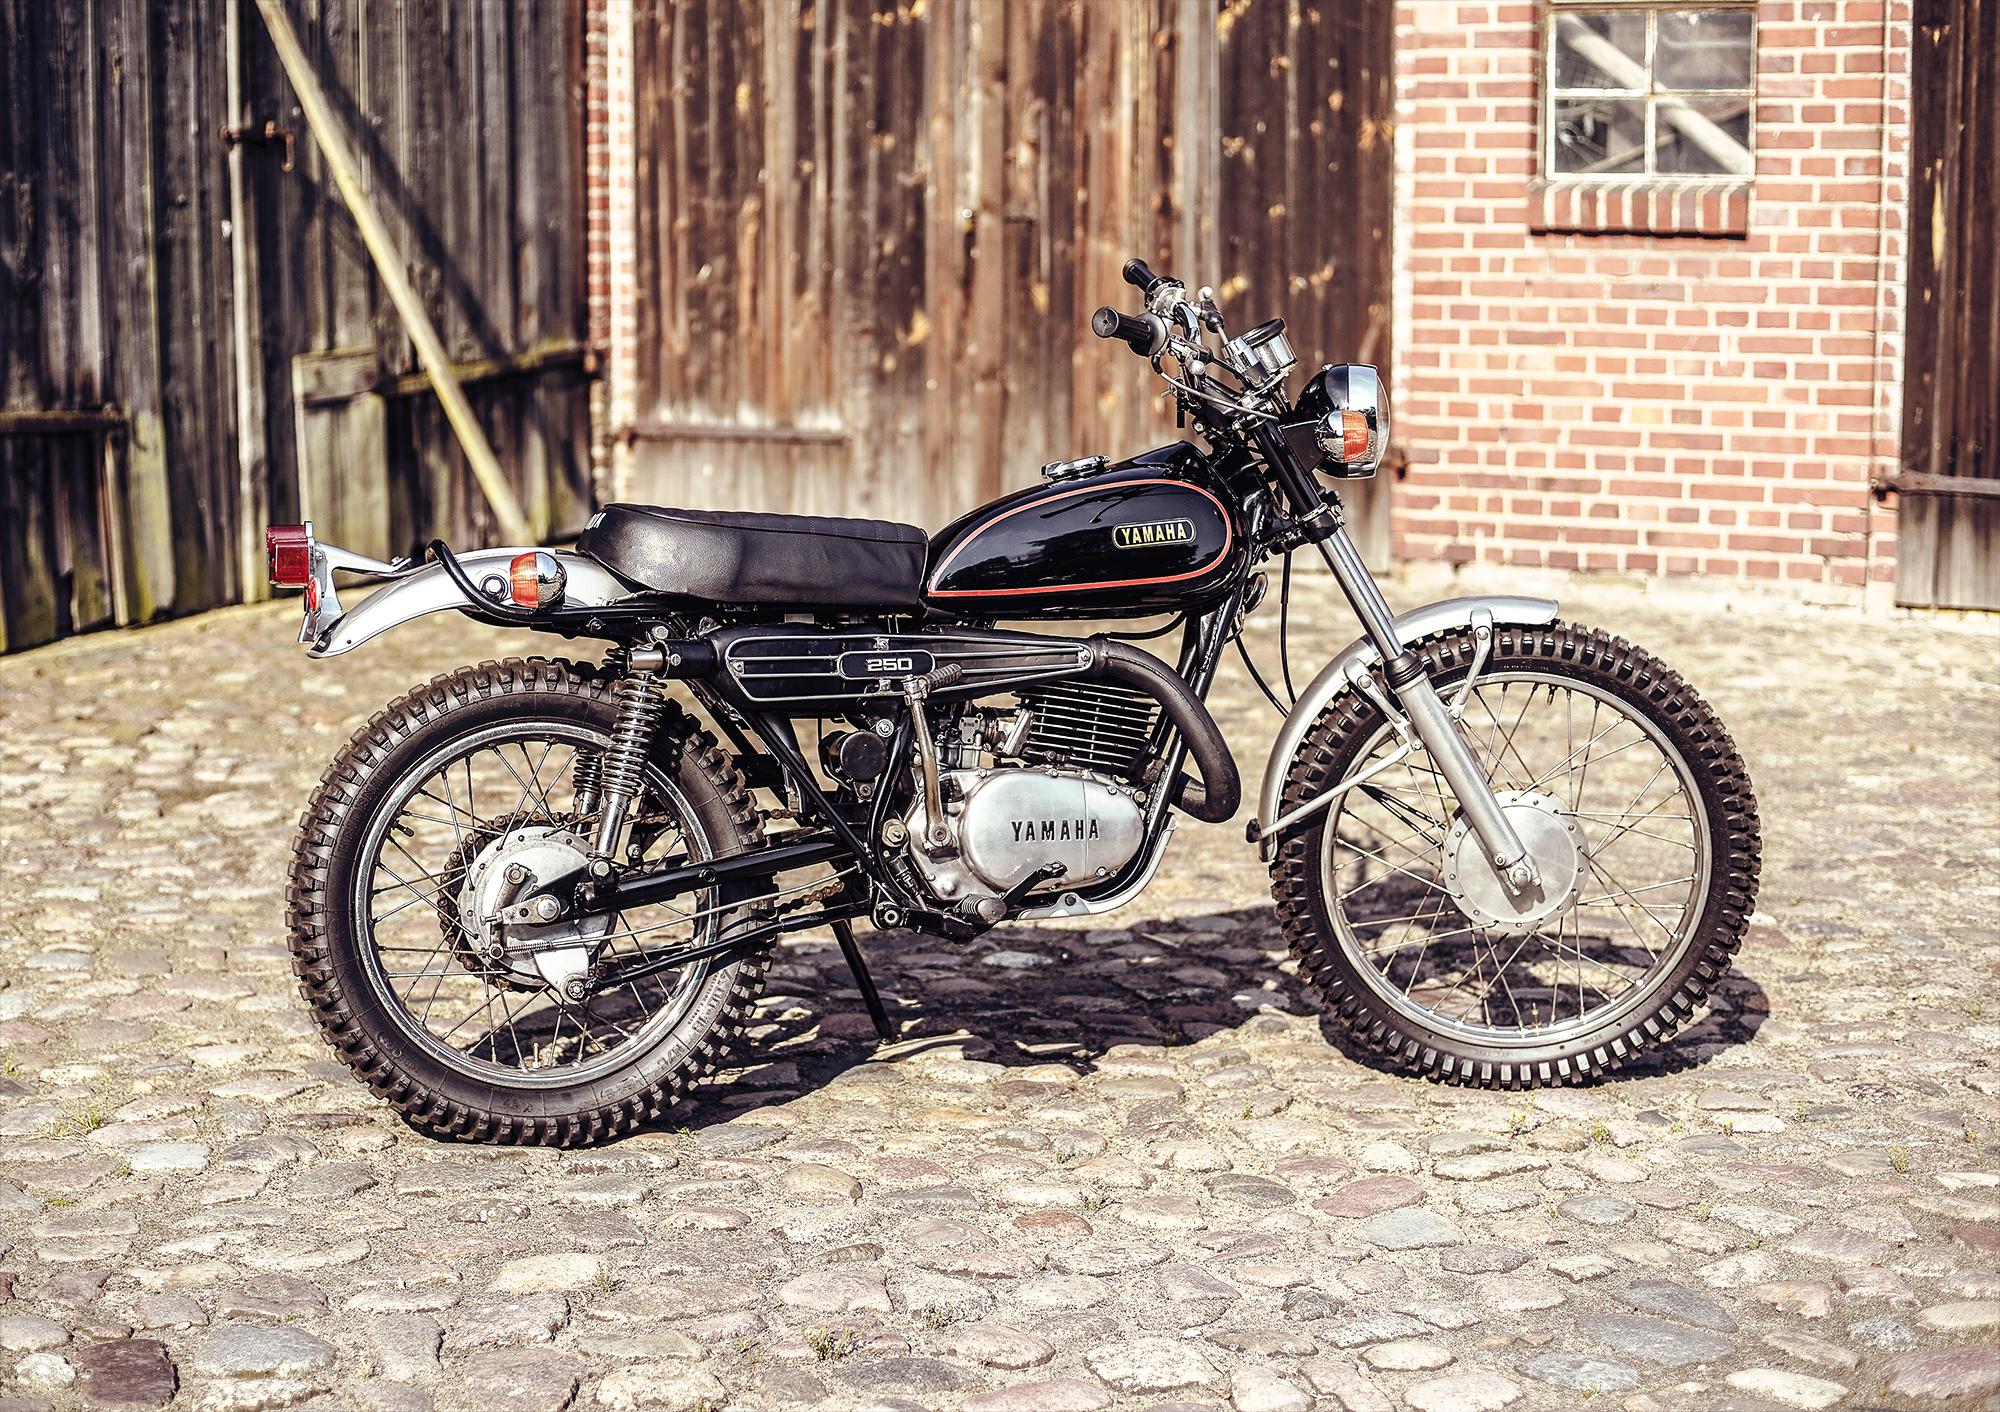 1973 Yamaha DT2 250